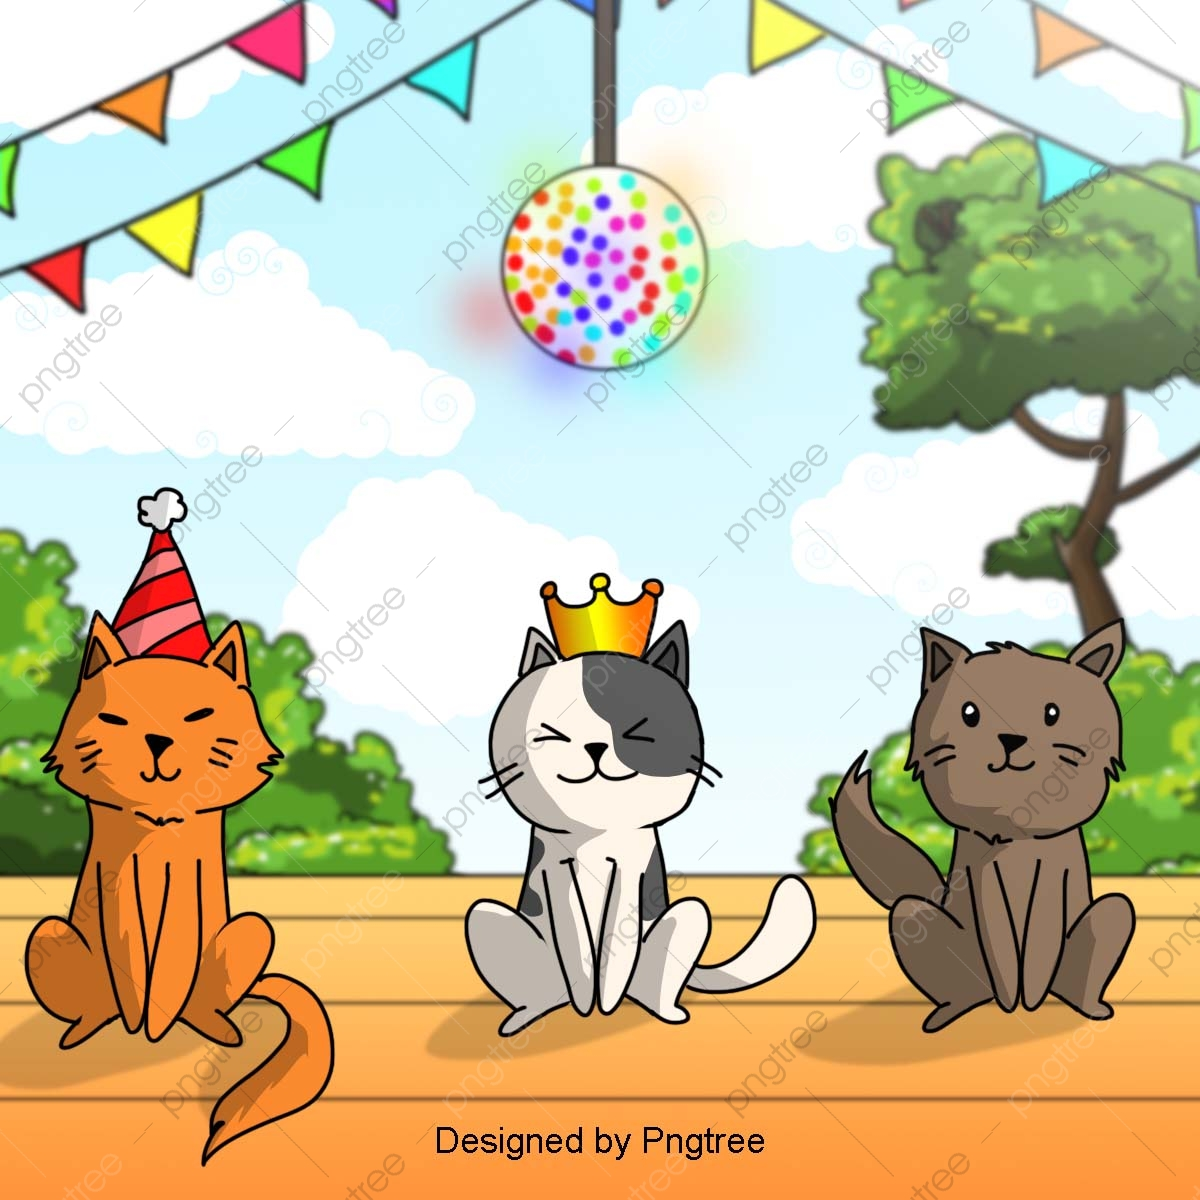 Free birthday clipart pets jpg.  celebration years of